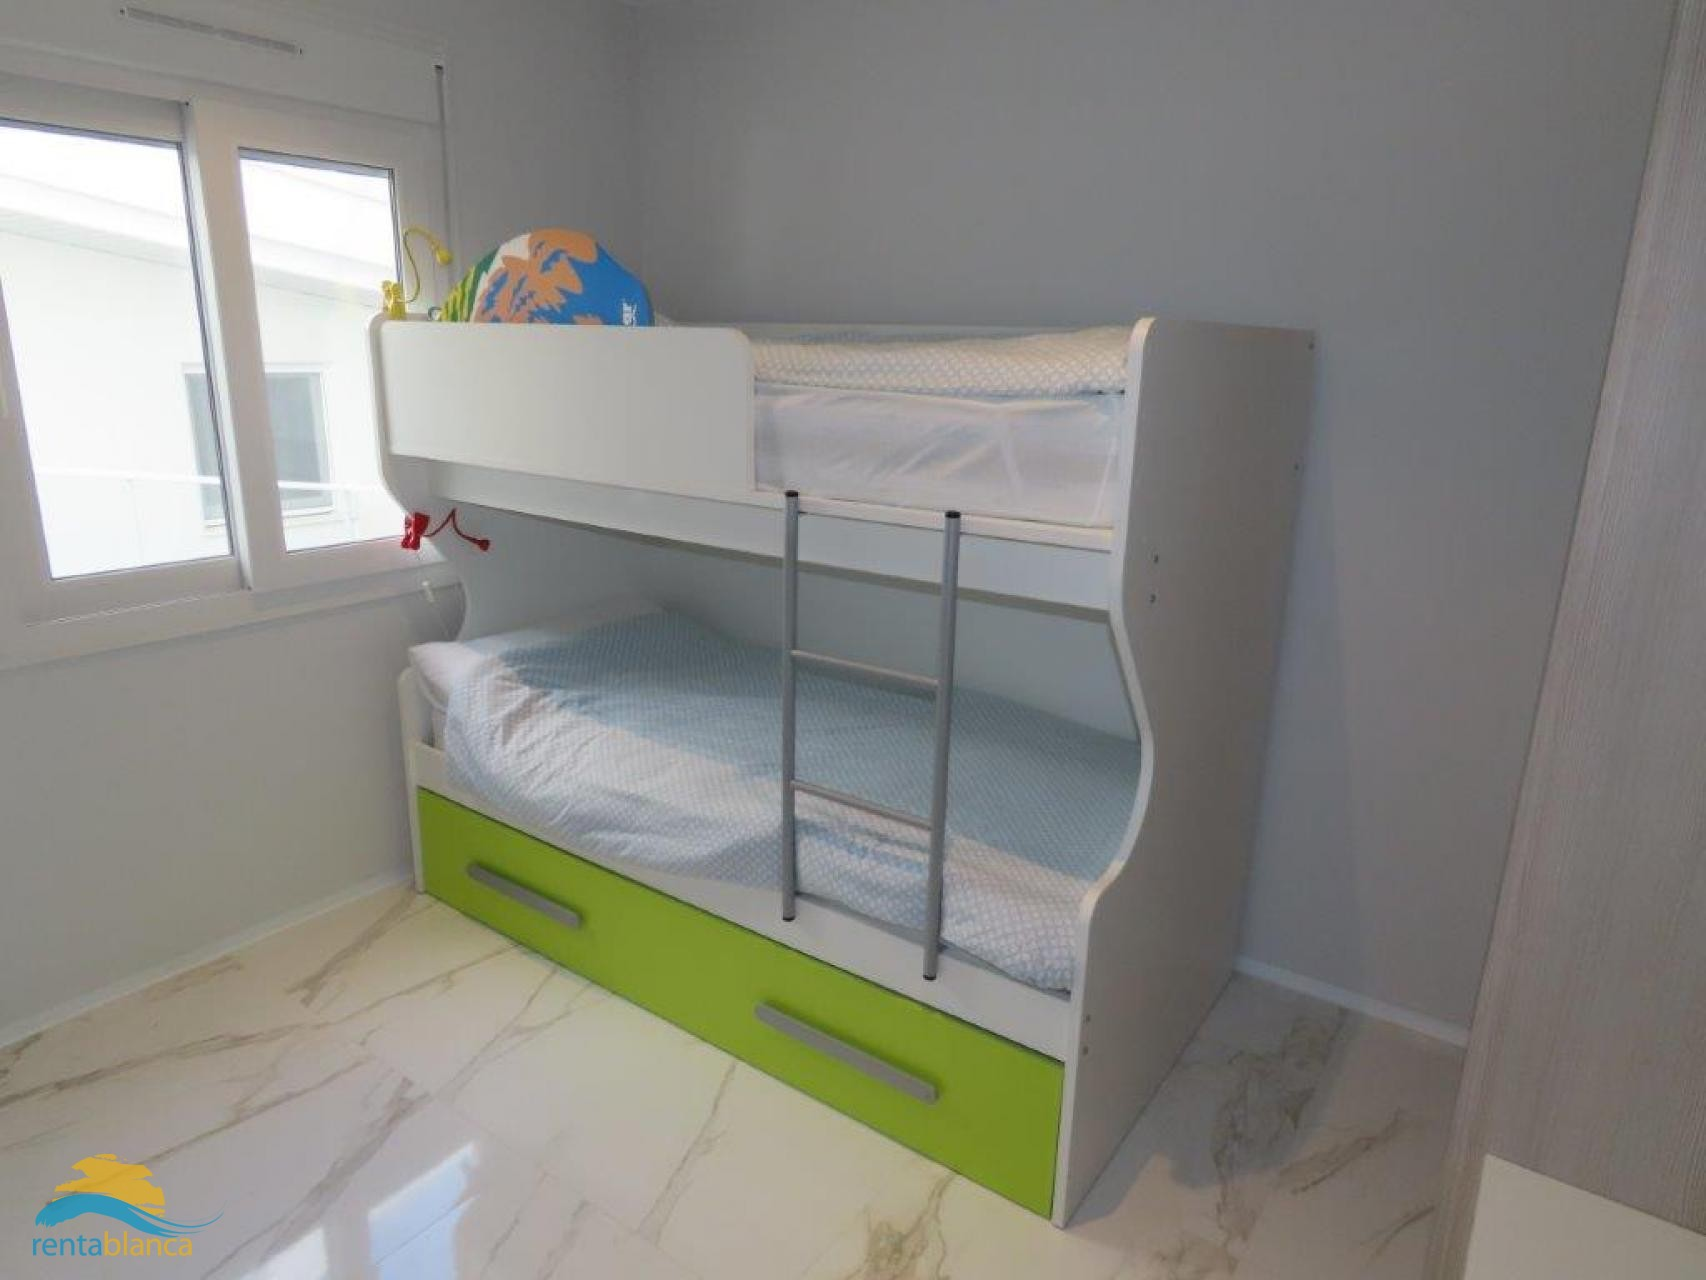 Apartment Natura Pinet - Rentablanca